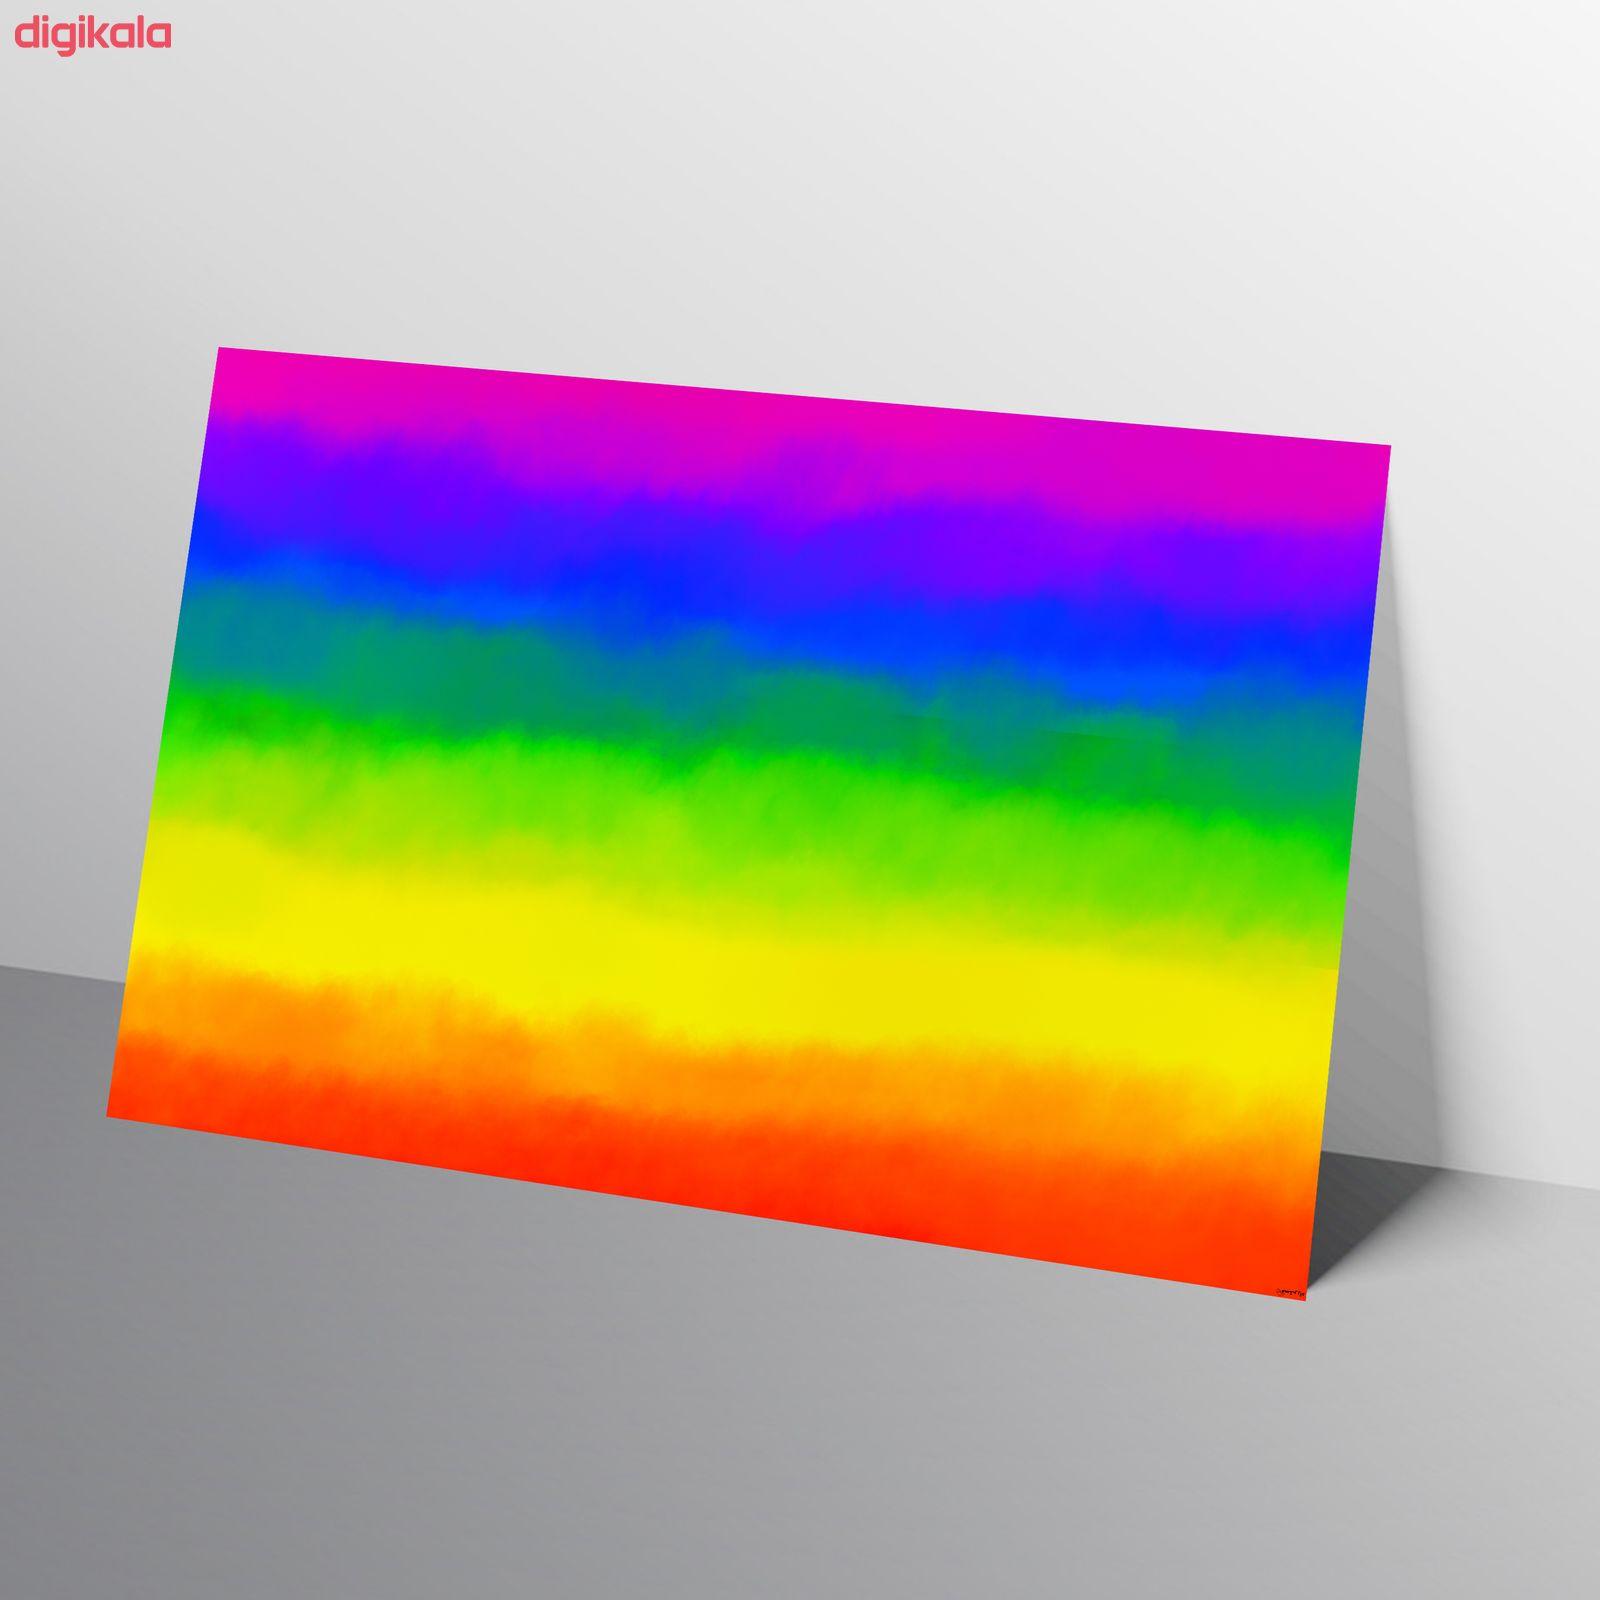 کاغذ رنگی A4 مستر راد مدل آبرنگ بسته 10 عددی main 1 13